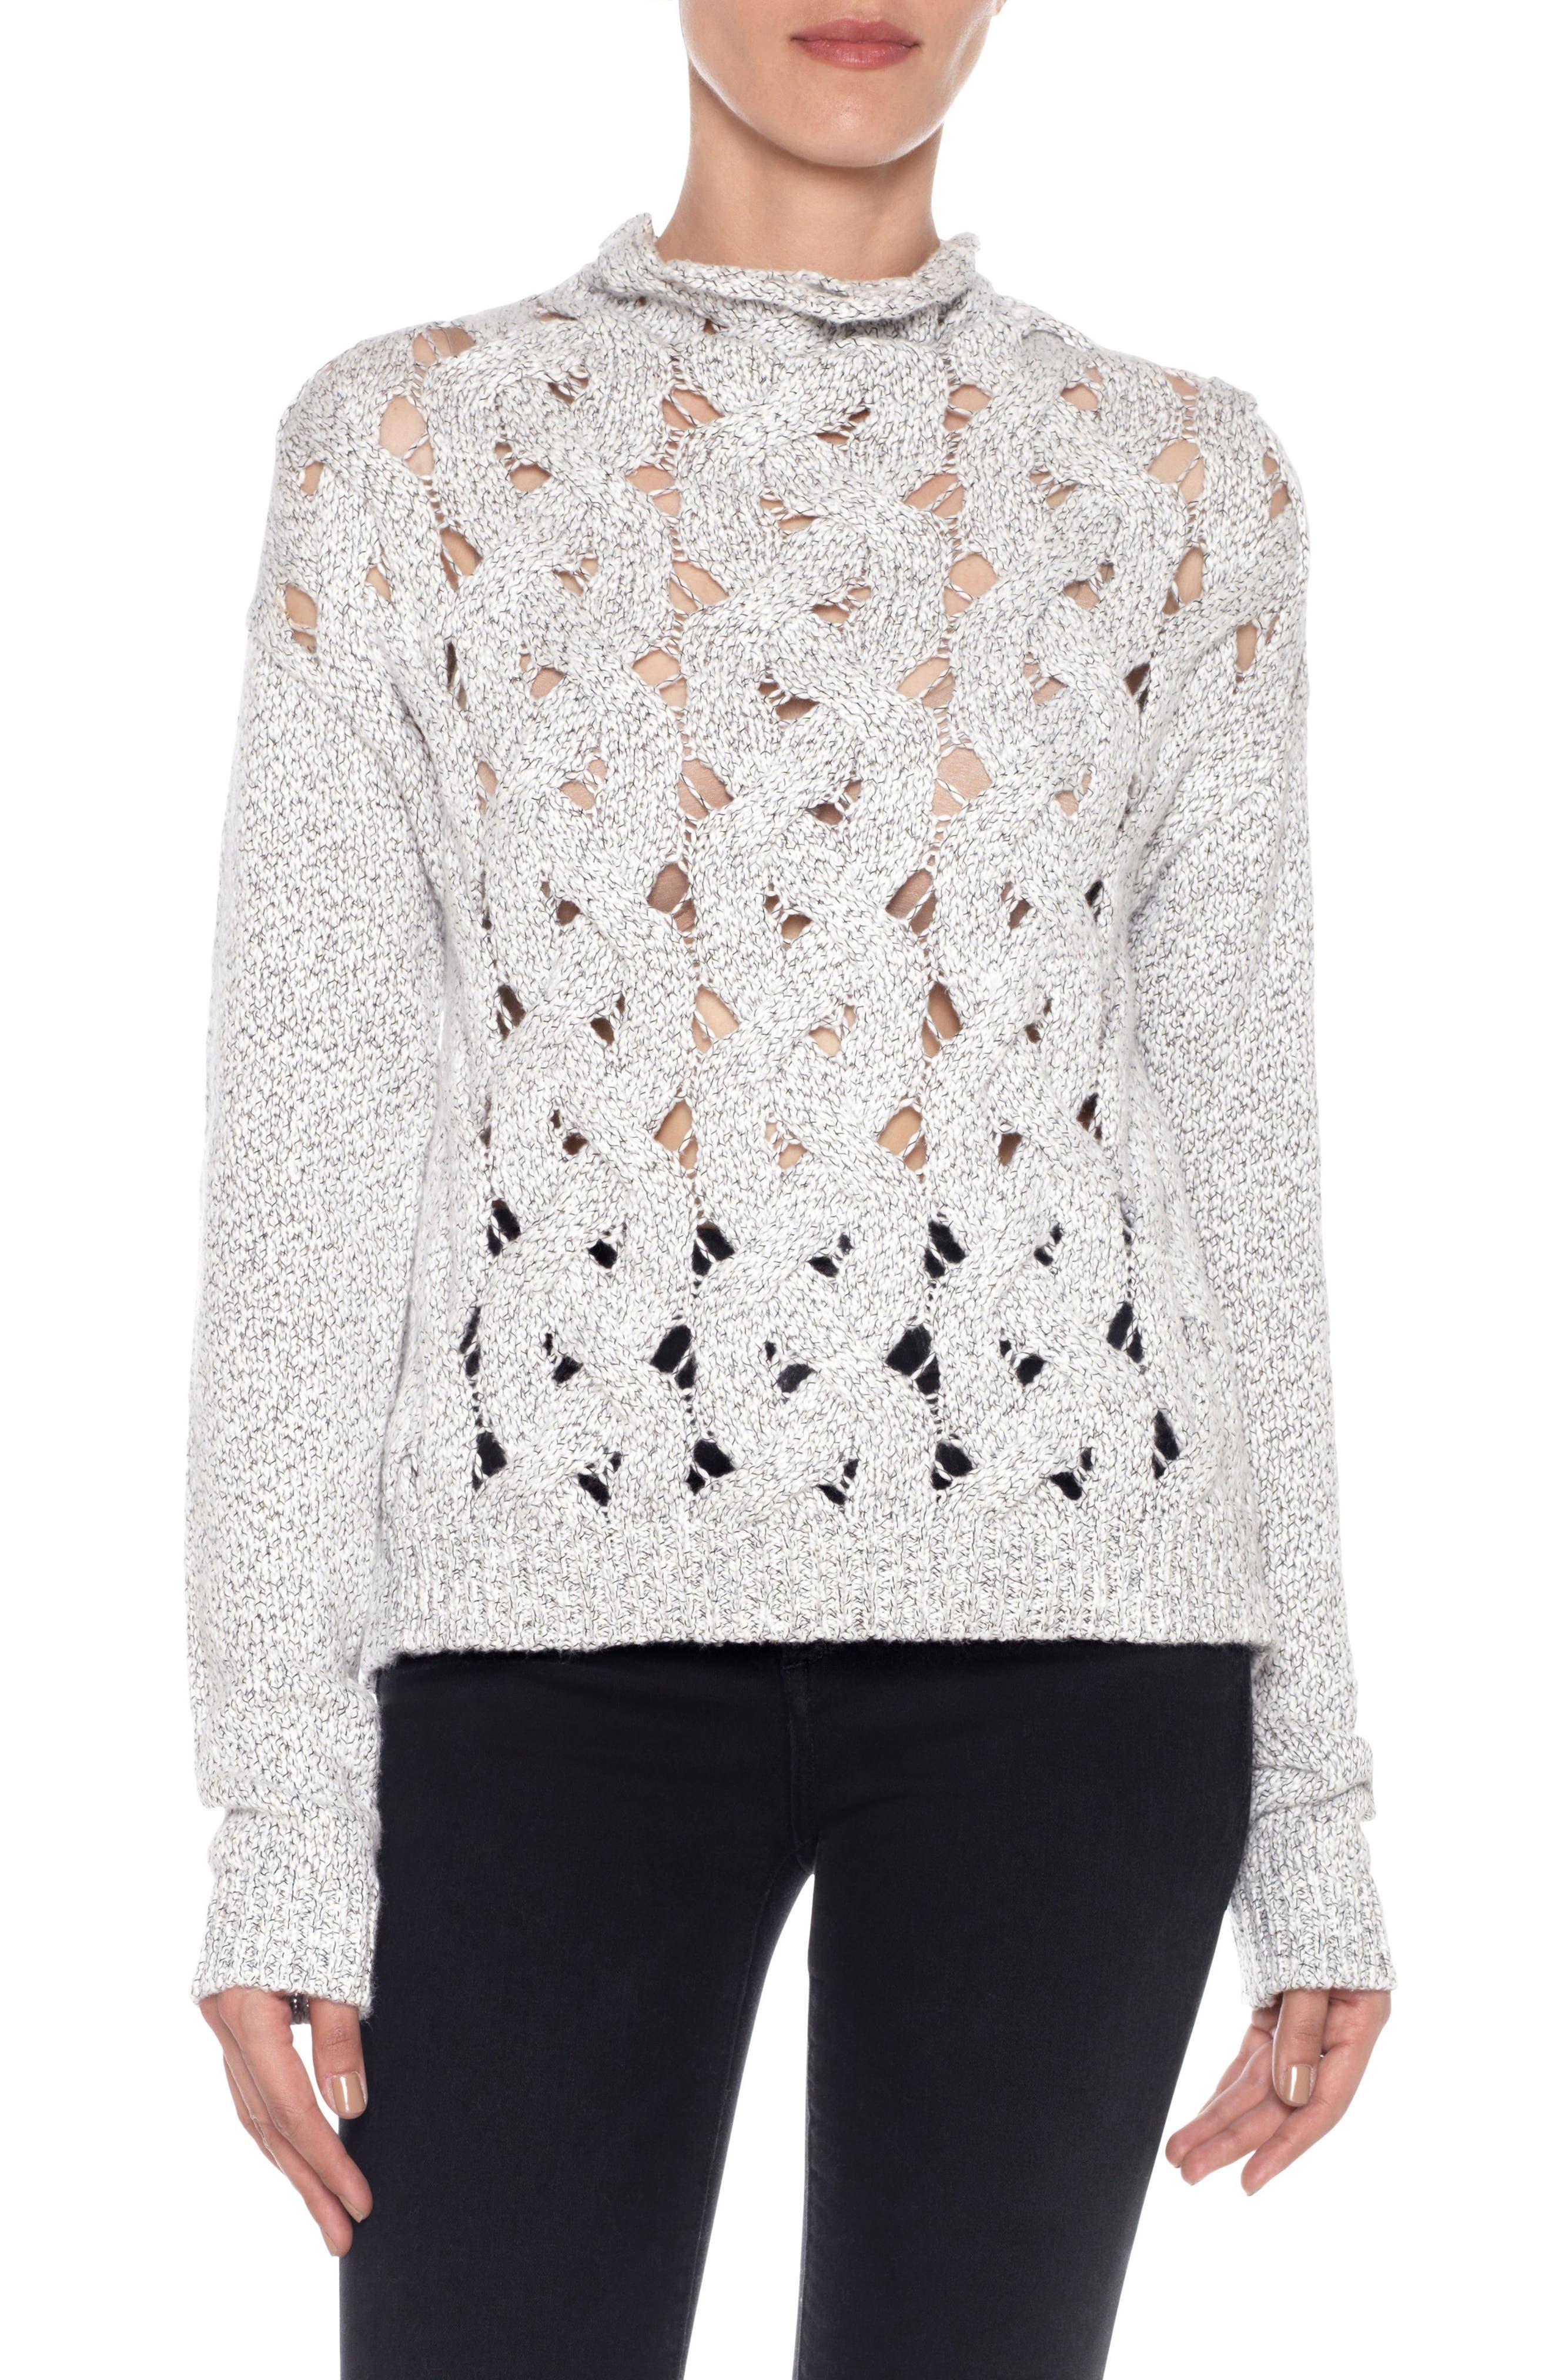 Aubree Roll Neck Sweater,                         Main,                         color, White/ Black